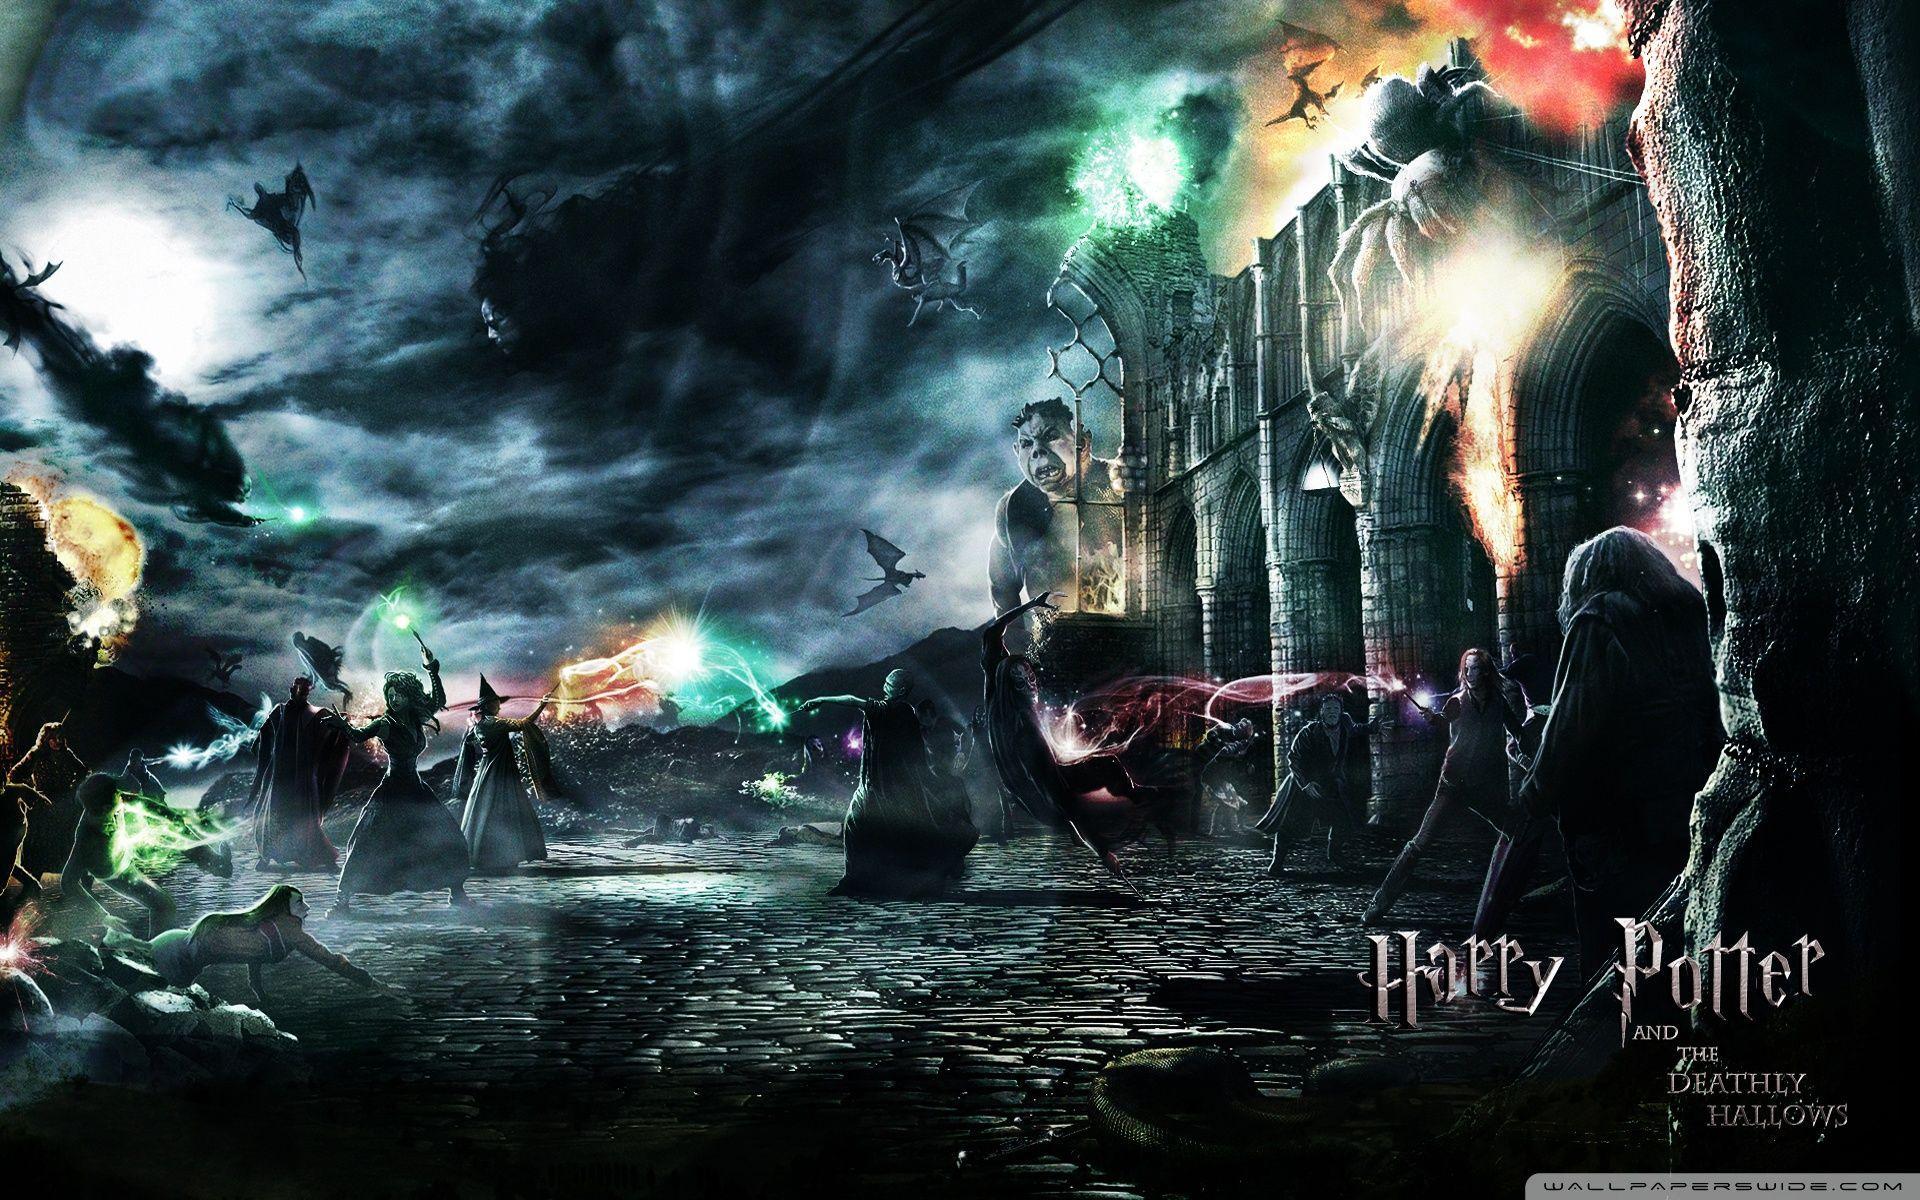 1920x1200 Three Harry Potter Villain Characters Poster Hd Wallpaper